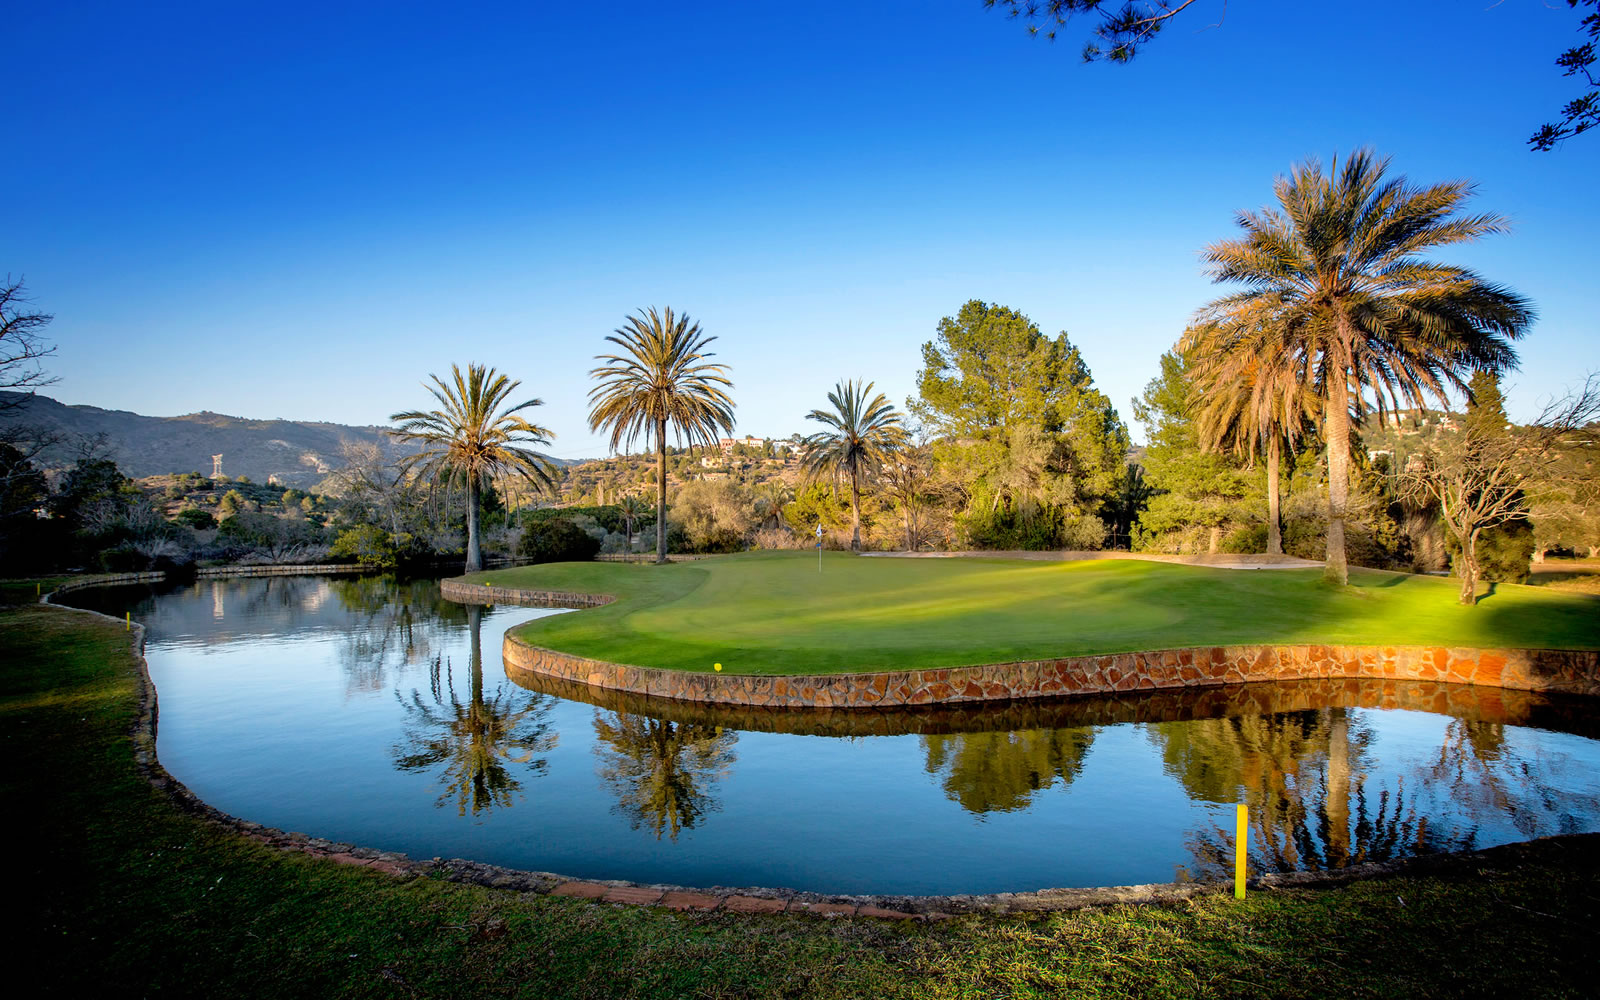 CAmpo de golf del Mediterraneo Castellón